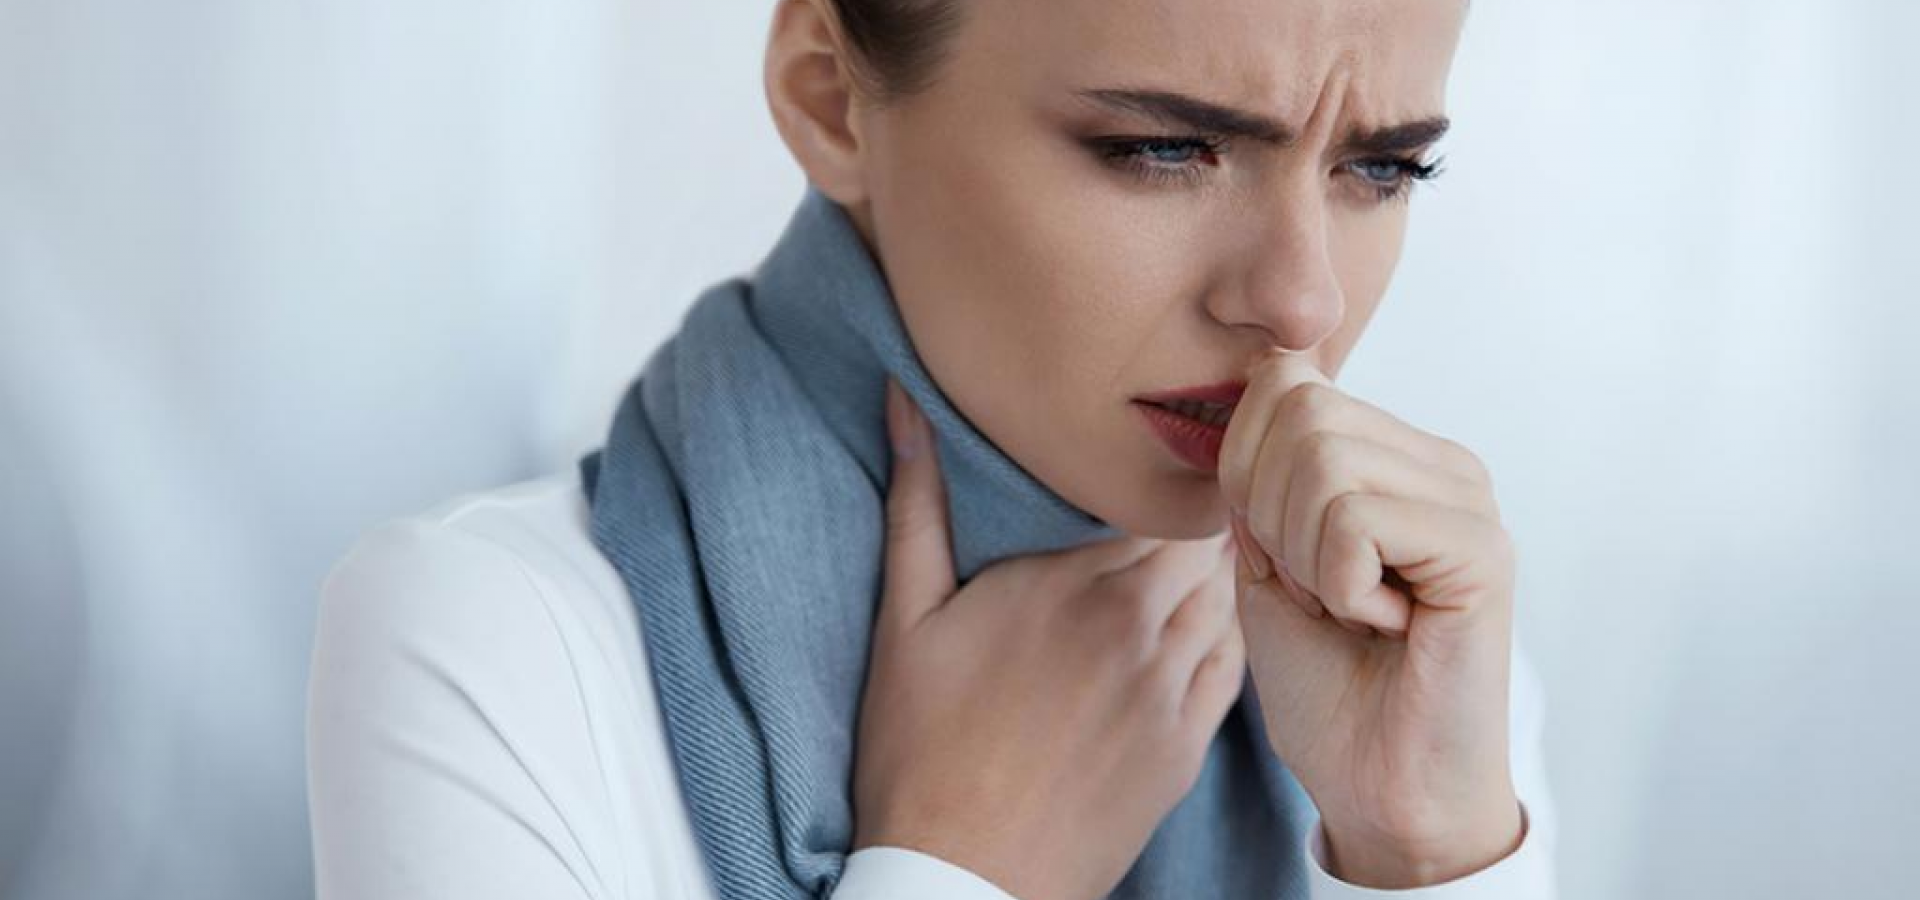 Лекарства от кашля при раке легких